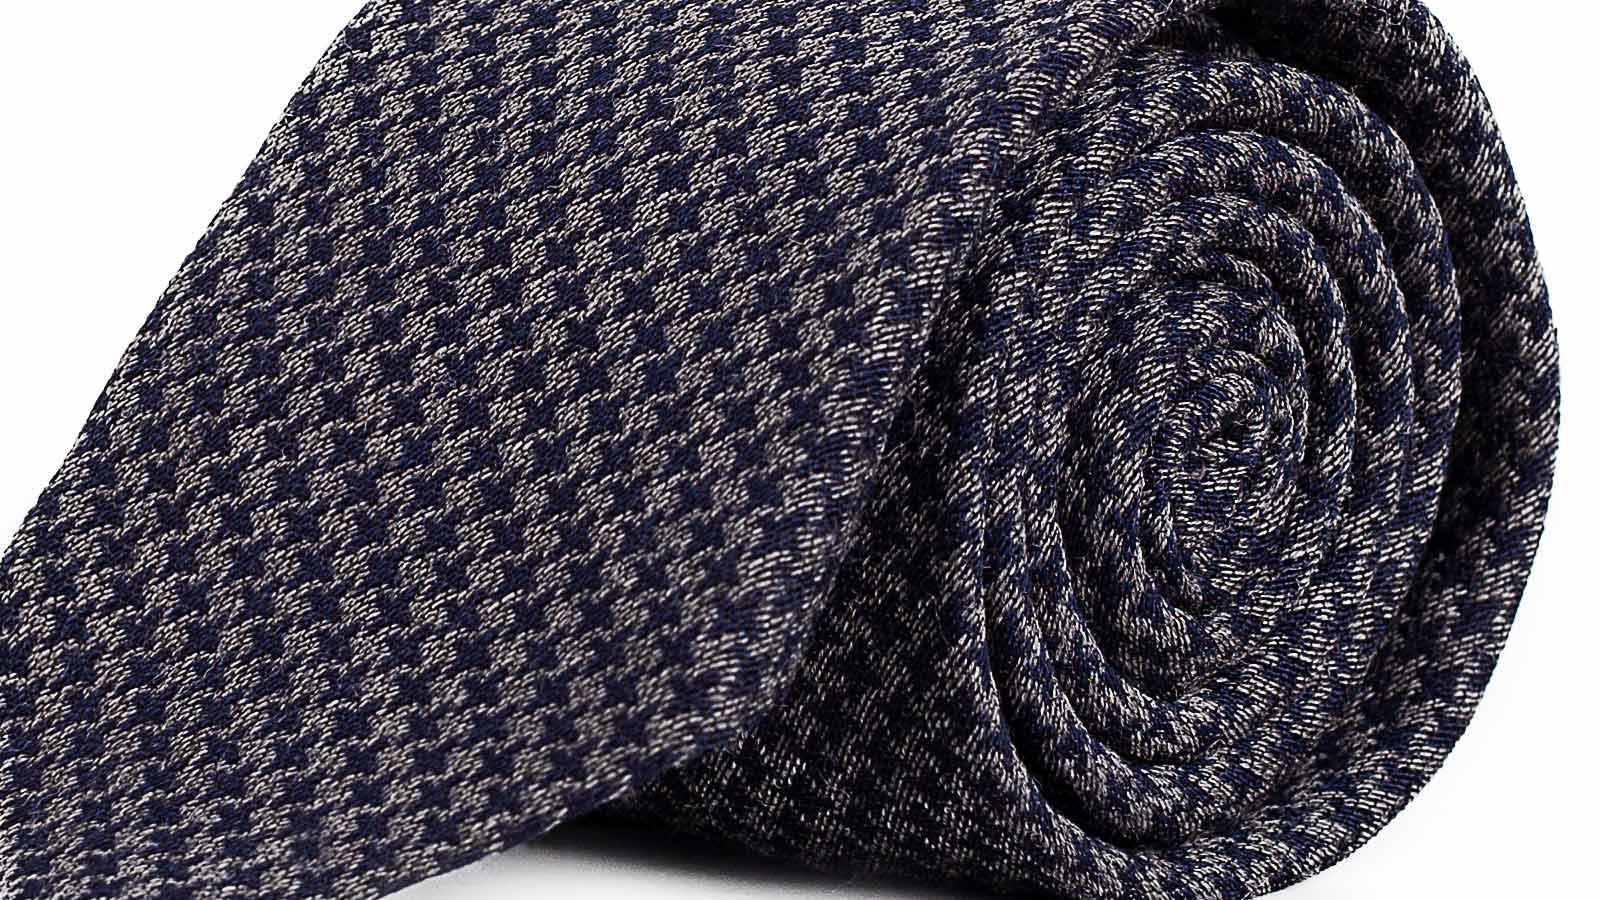 Blue & Grey Houndstooth Wool Tie - slider image